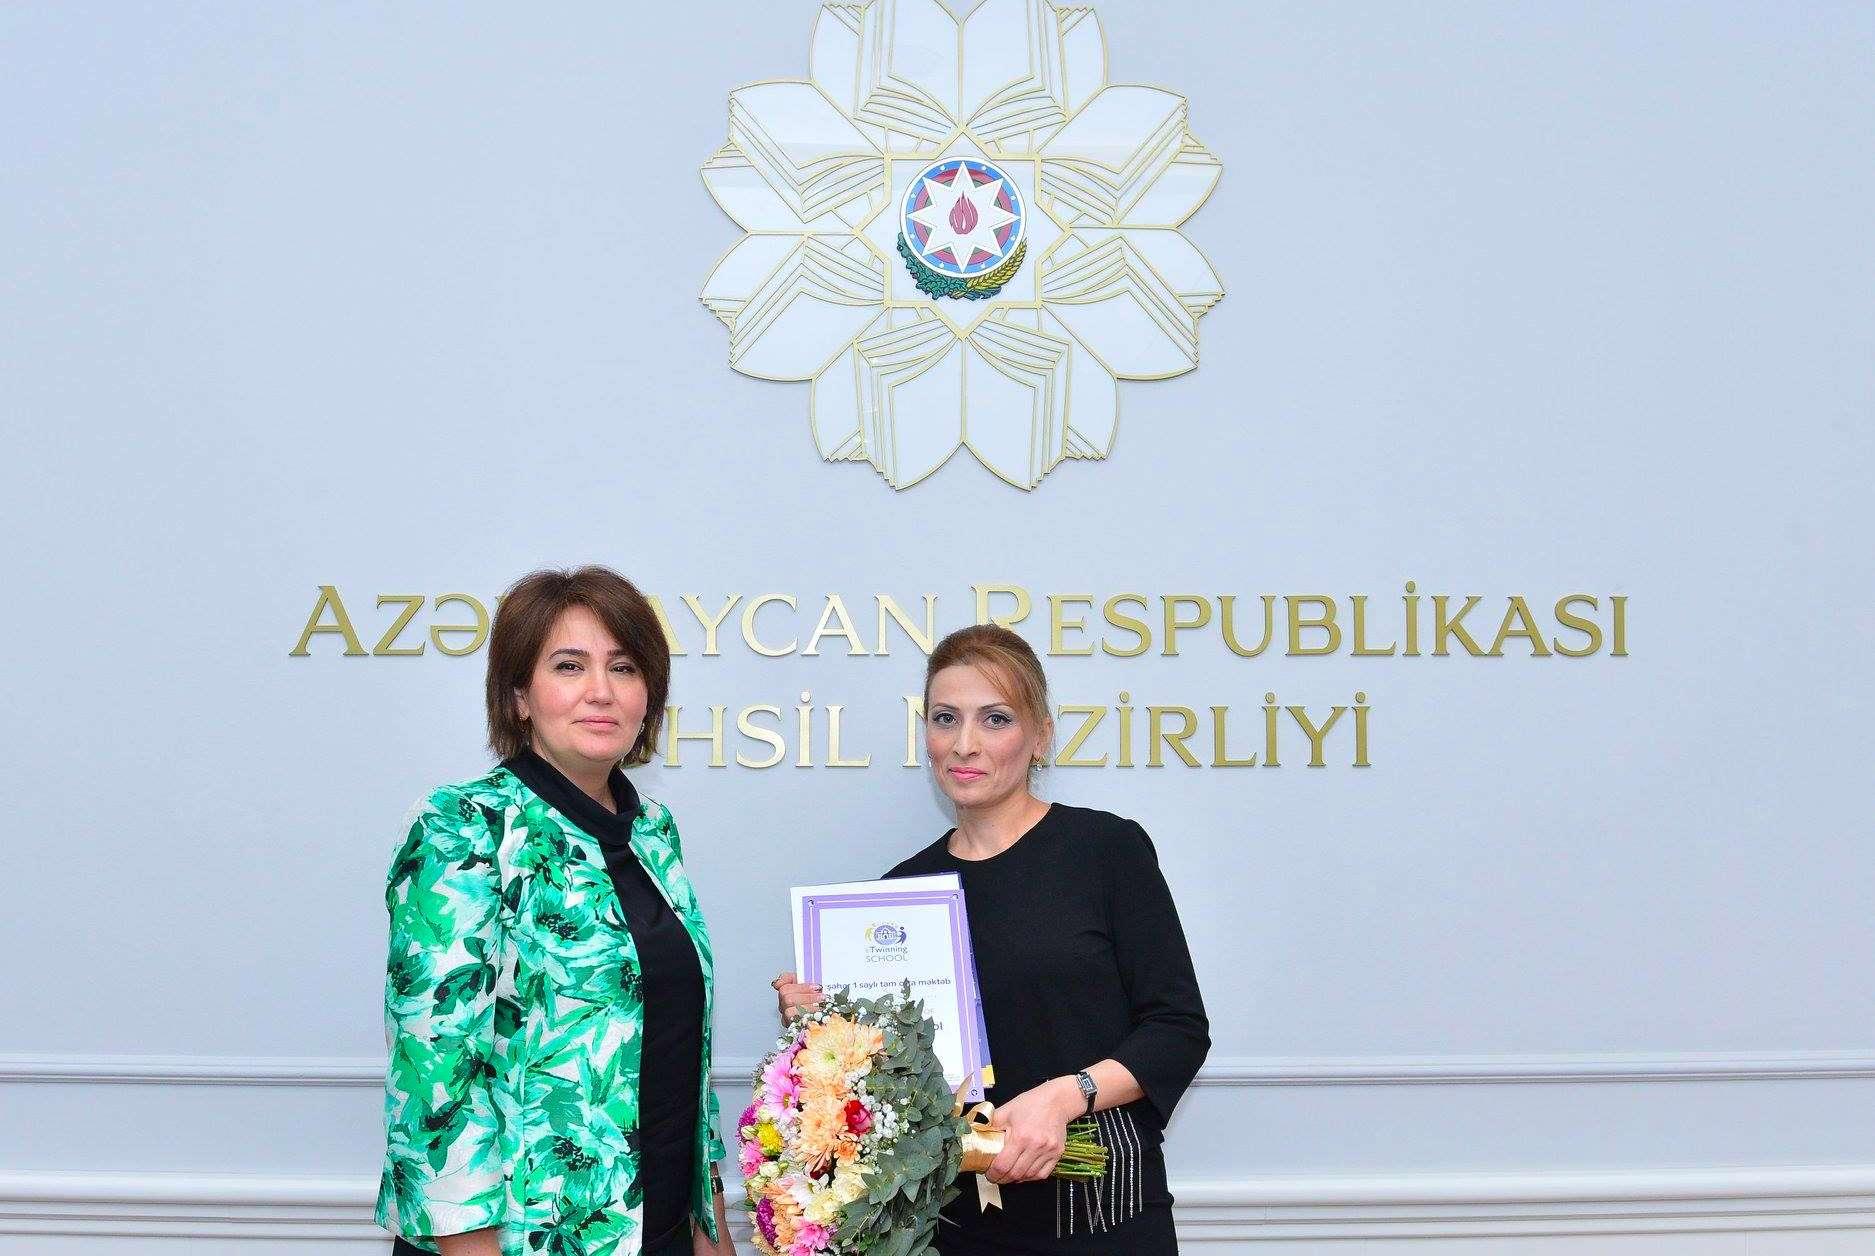 6 schools from Azerbaijan got 2018-2019 eTwinning school label